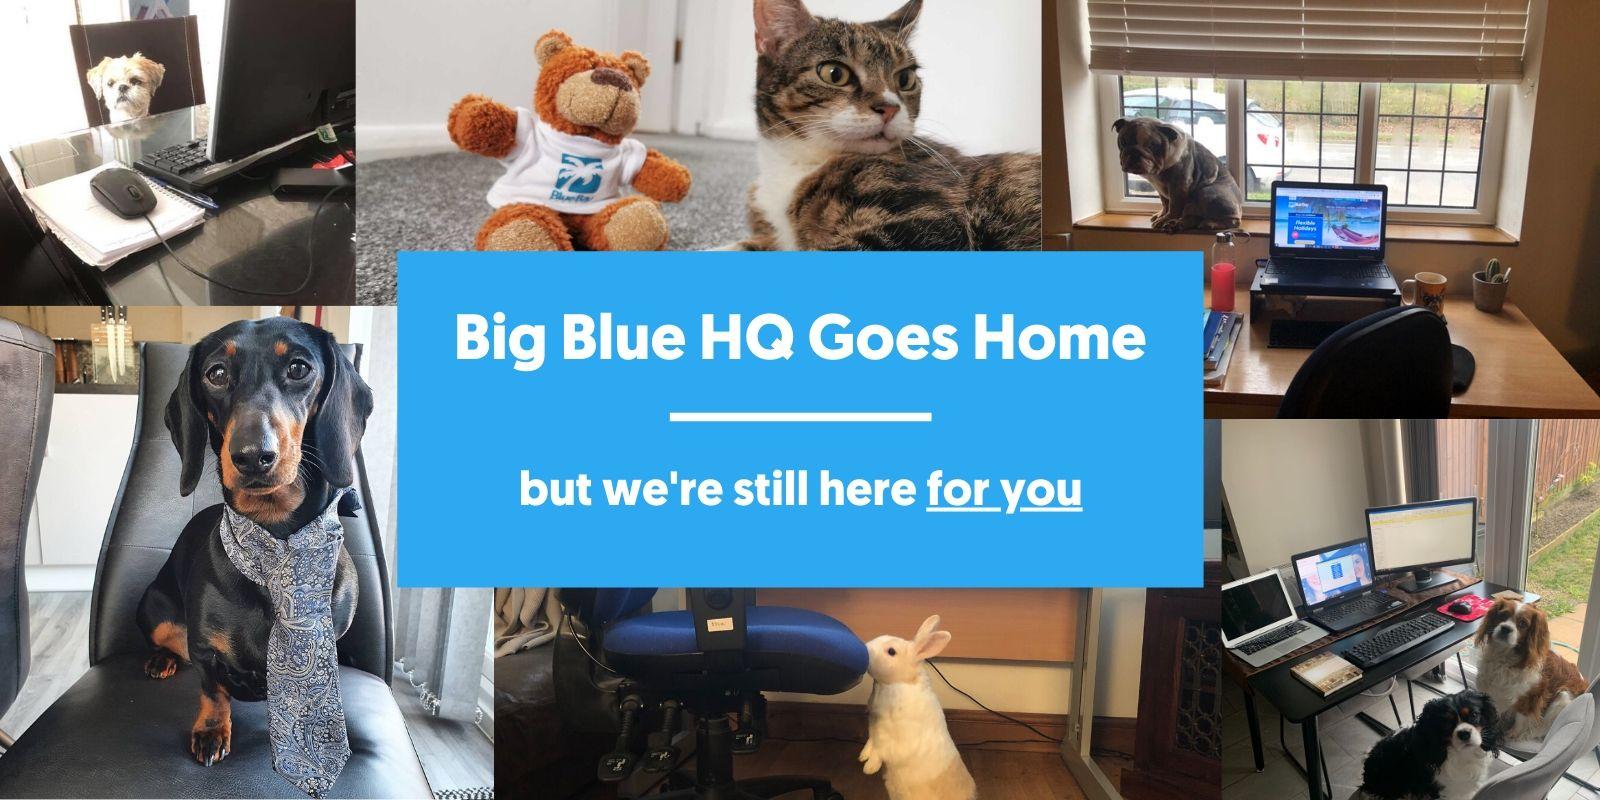 Blue Bay HQ Goes Home